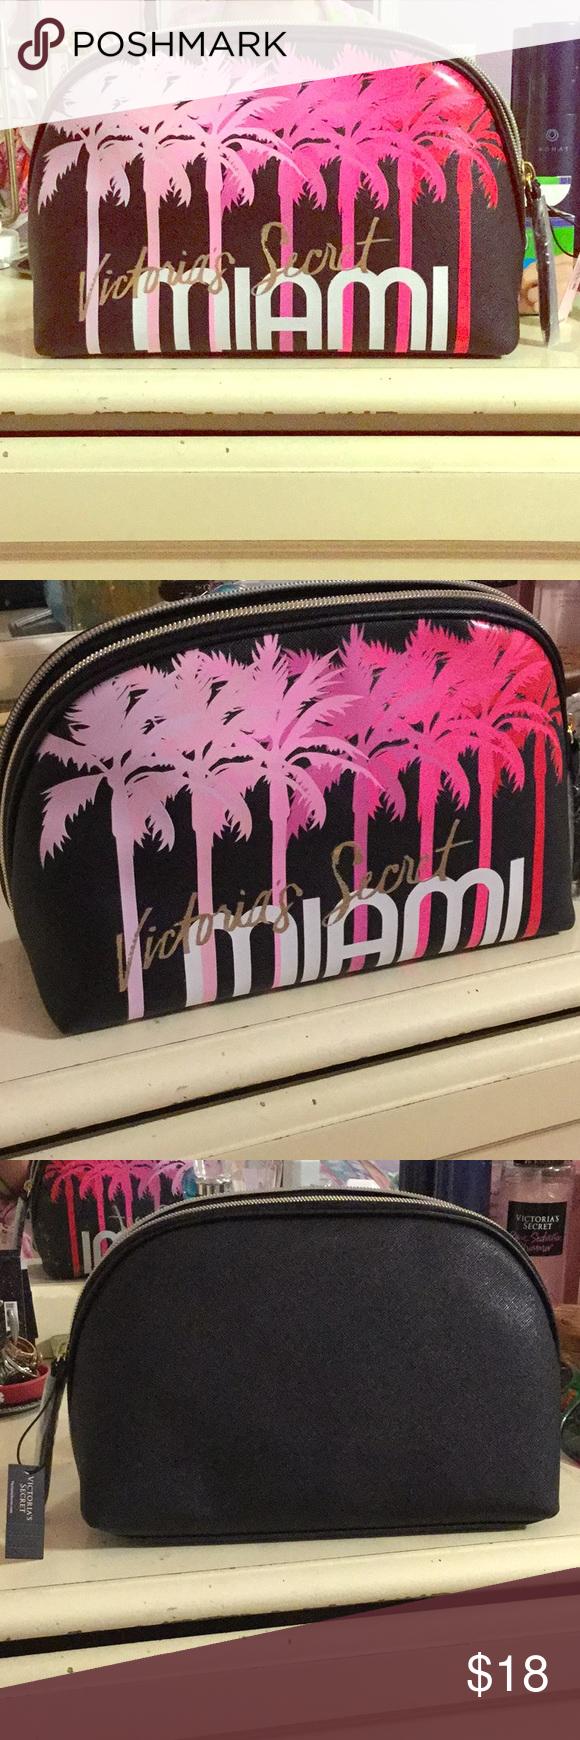 Victoria's Secret MIAMI glam bag VS Miami multipurpose